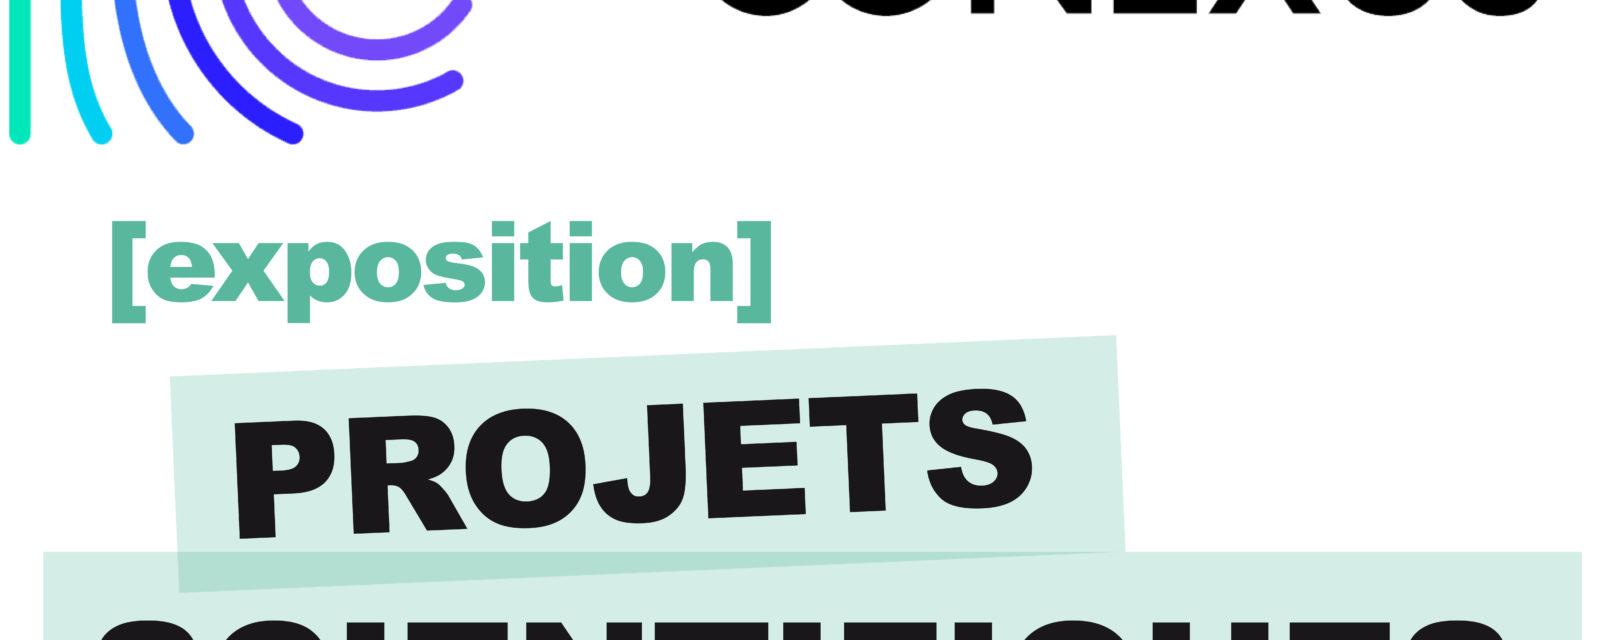 Exposition - EU CONEXUS [projets scientifiques]